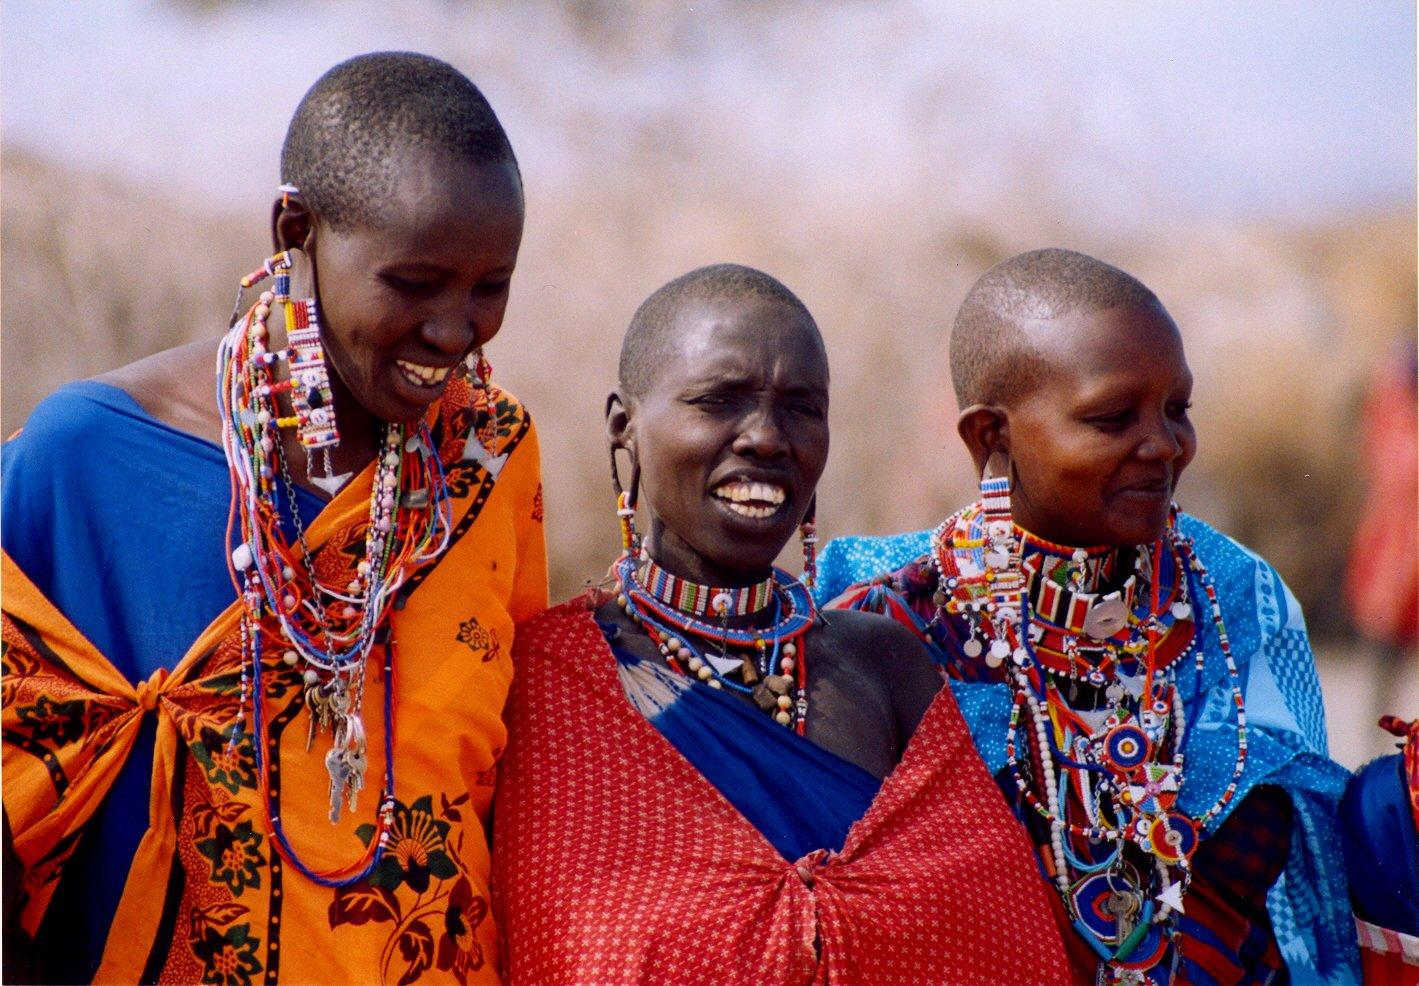 pygmy people